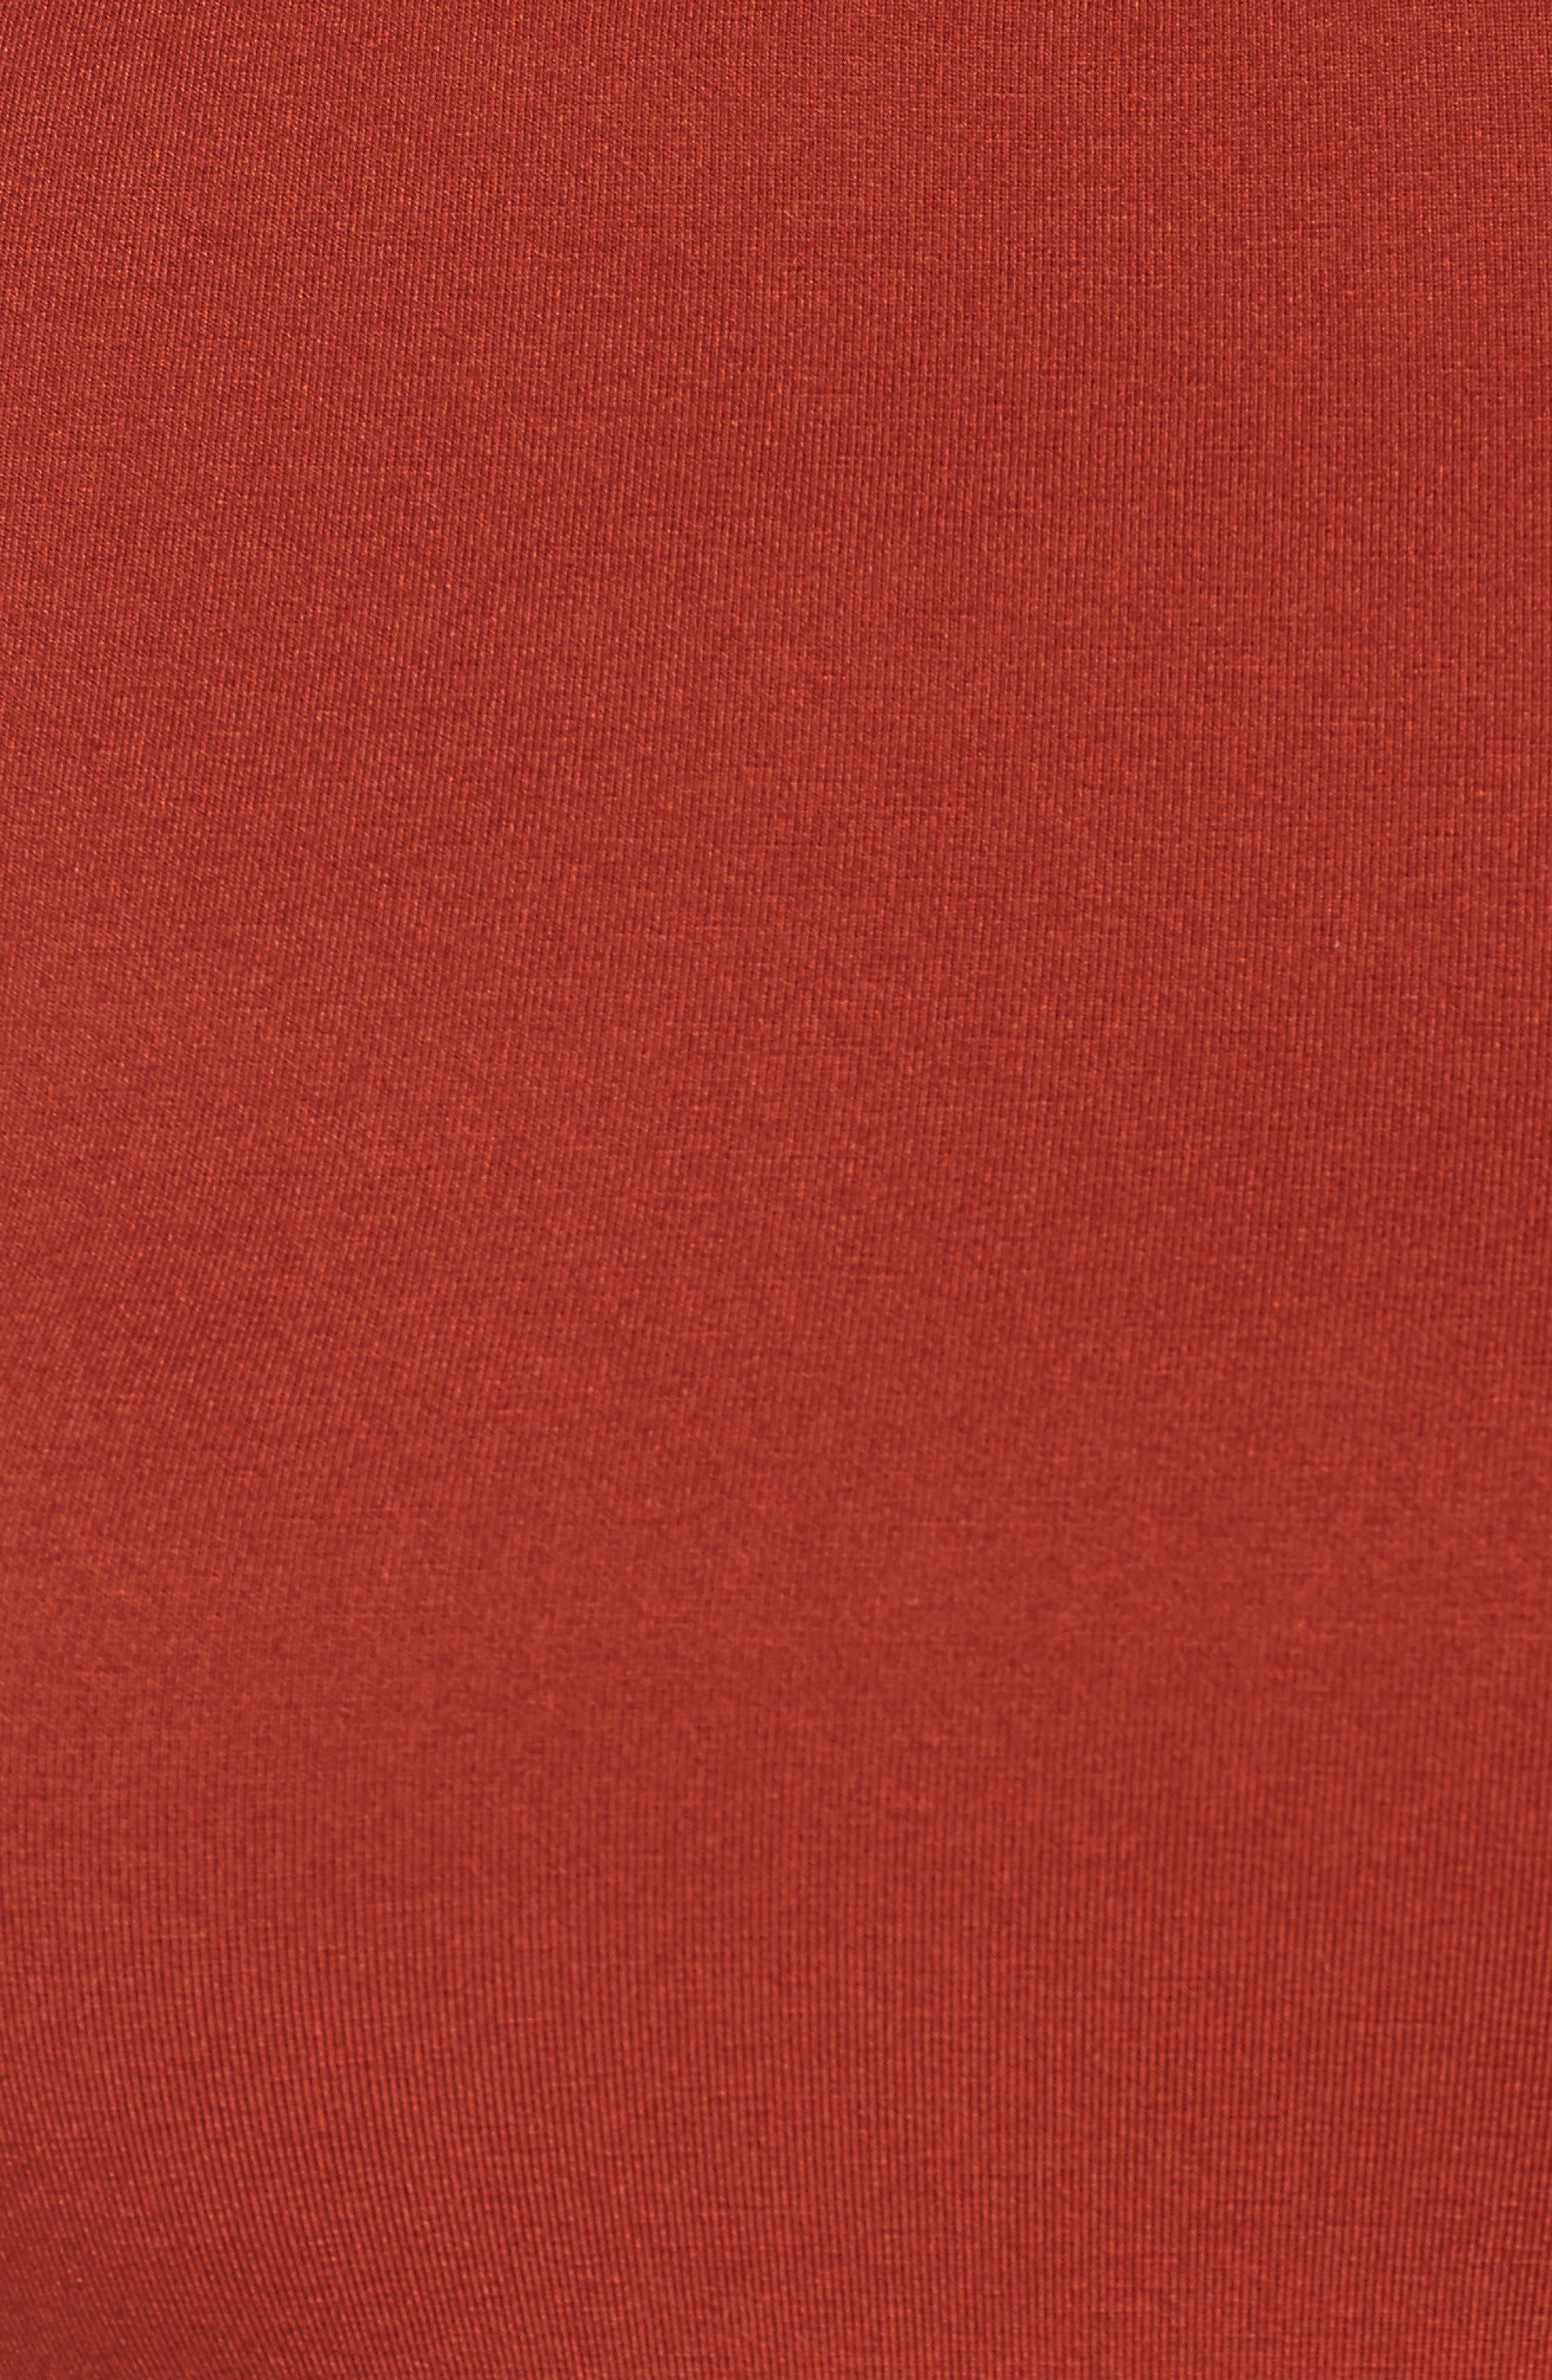 Open Back Crop Turtleneck,                             Alternate thumbnail 6, color,                             600